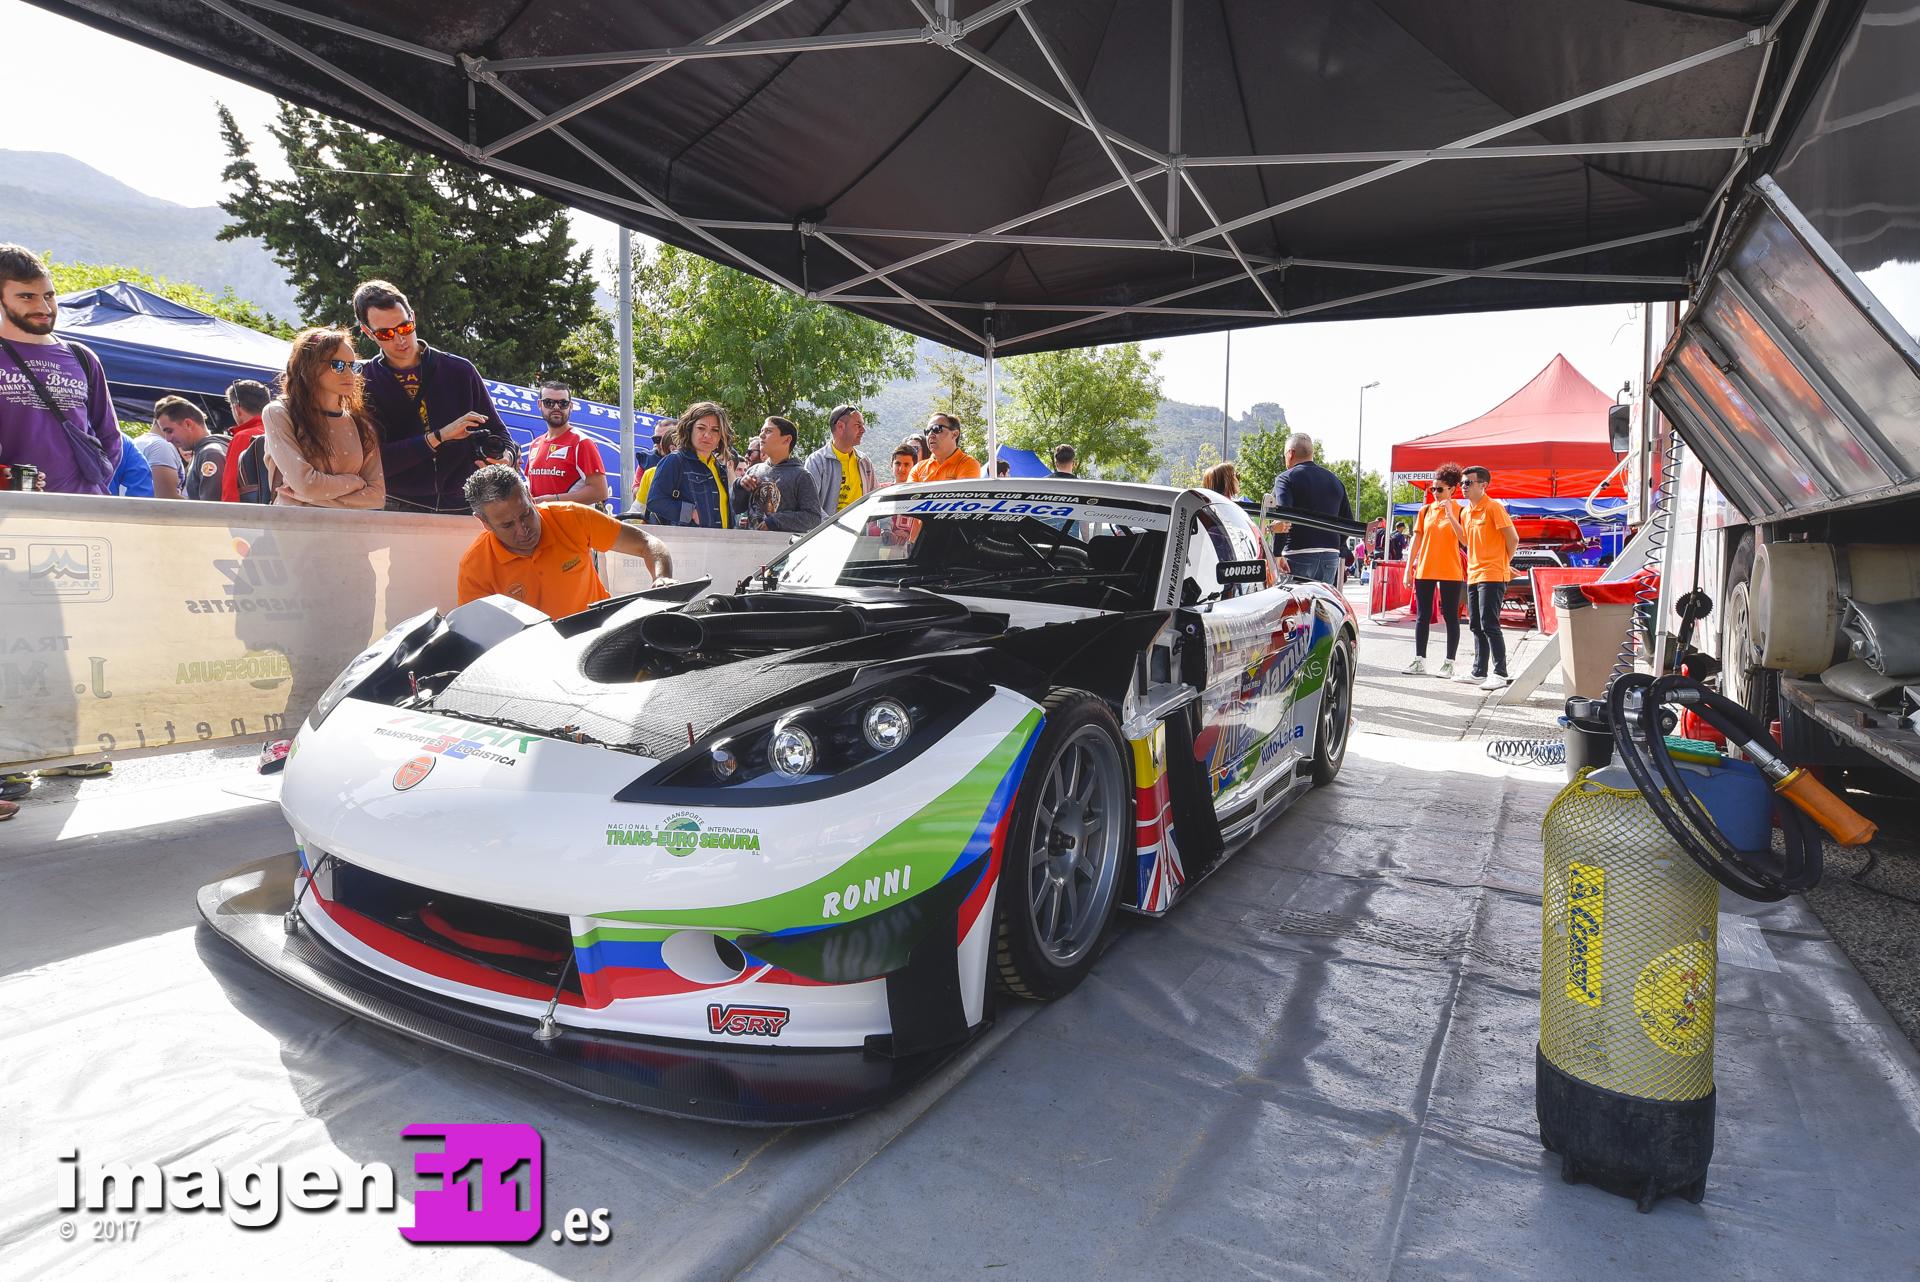 Jose Antonio Aznar, Ginetta G55 GT3, Subida a Ubrique 2017